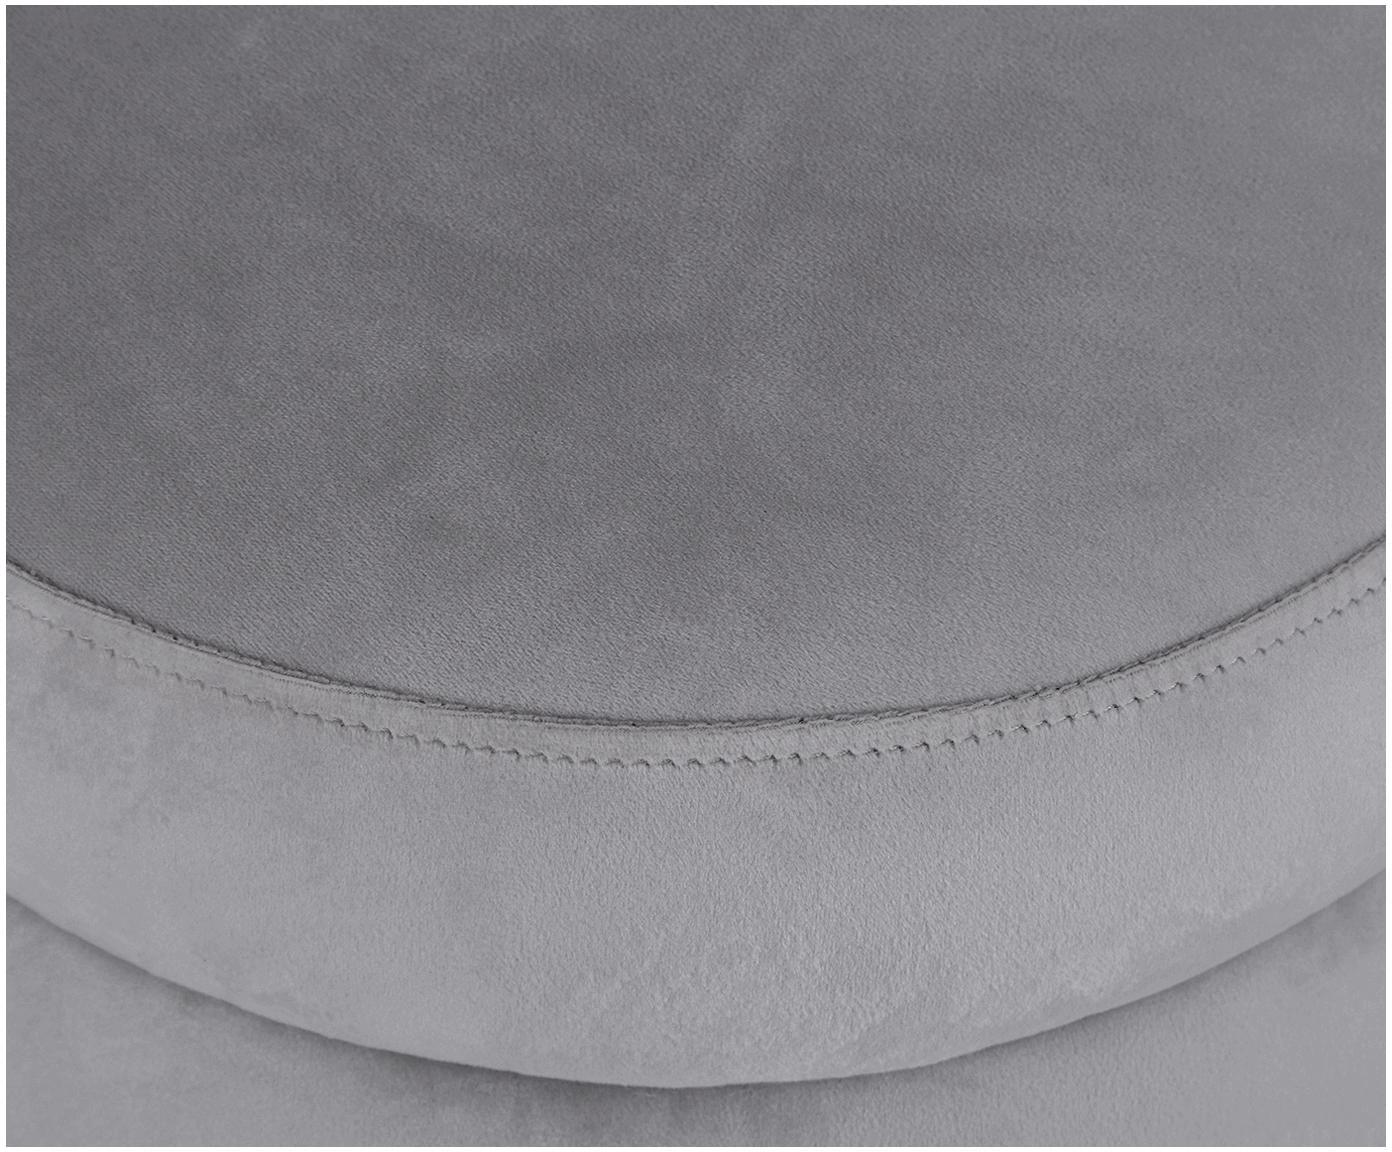 Samt-Polsterbank Alto, Bezug: Samt (Polyester) 30.000 S, Gestell: Sperrholz, Samt Grau, 110 x 48 cm